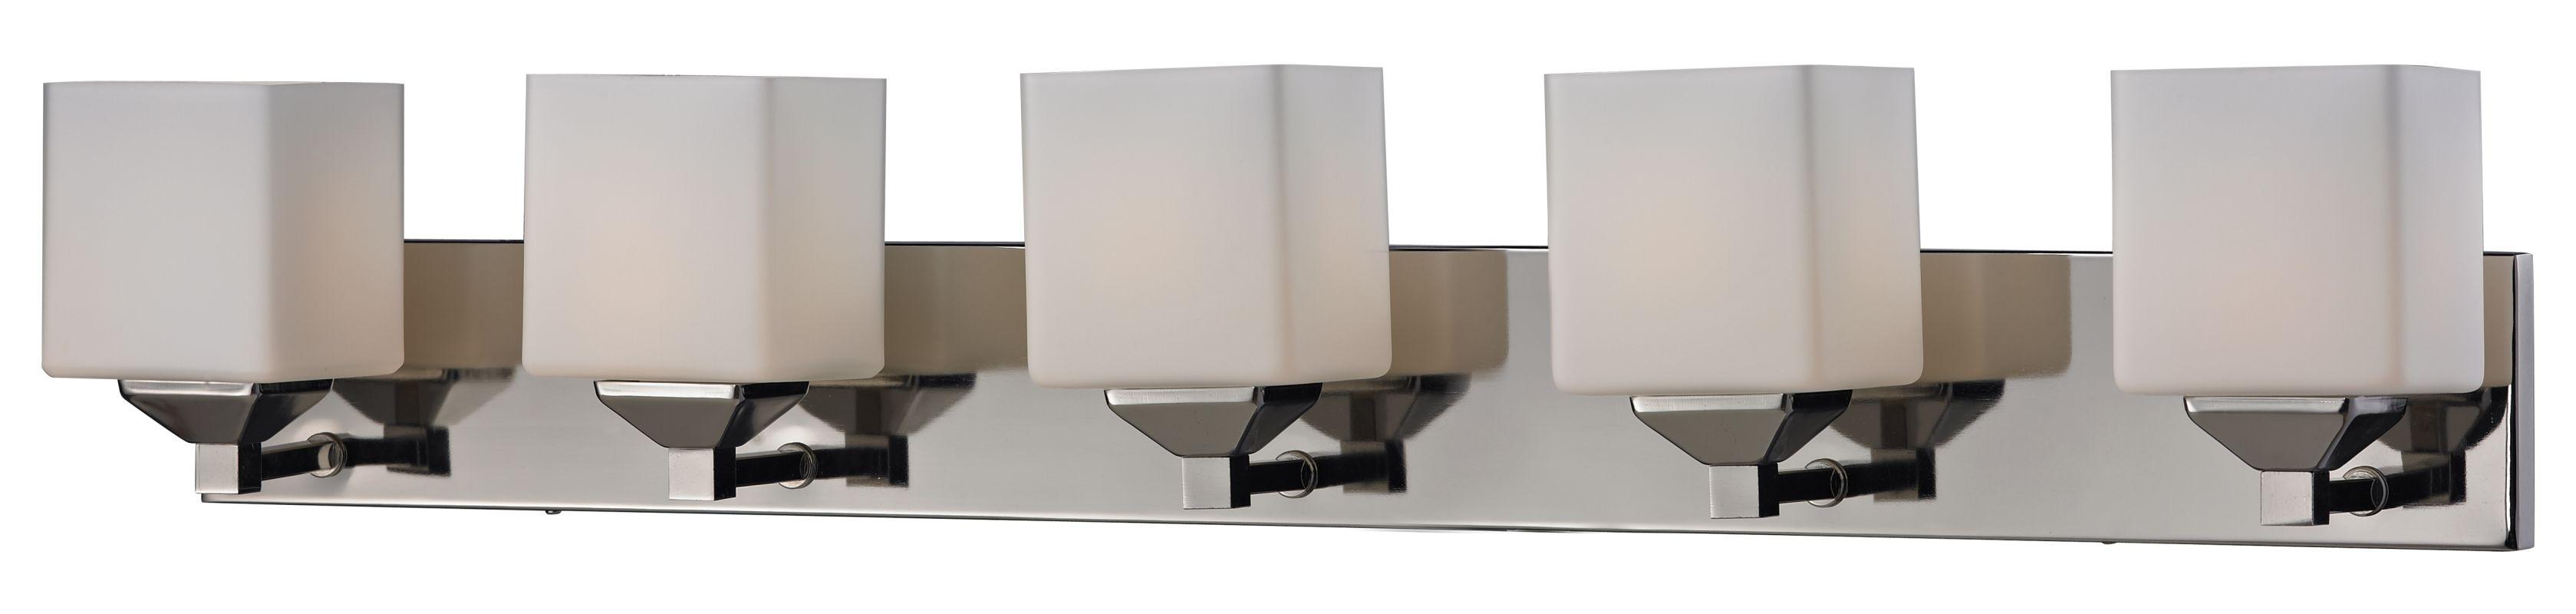 Z-Lite 2105-5V Quube 5 Light Bathroom Vanity Light with Matte Opal Sale $352.00 ITEM: bci2219664 ID#:2105-5V UPC: 685659022360 :